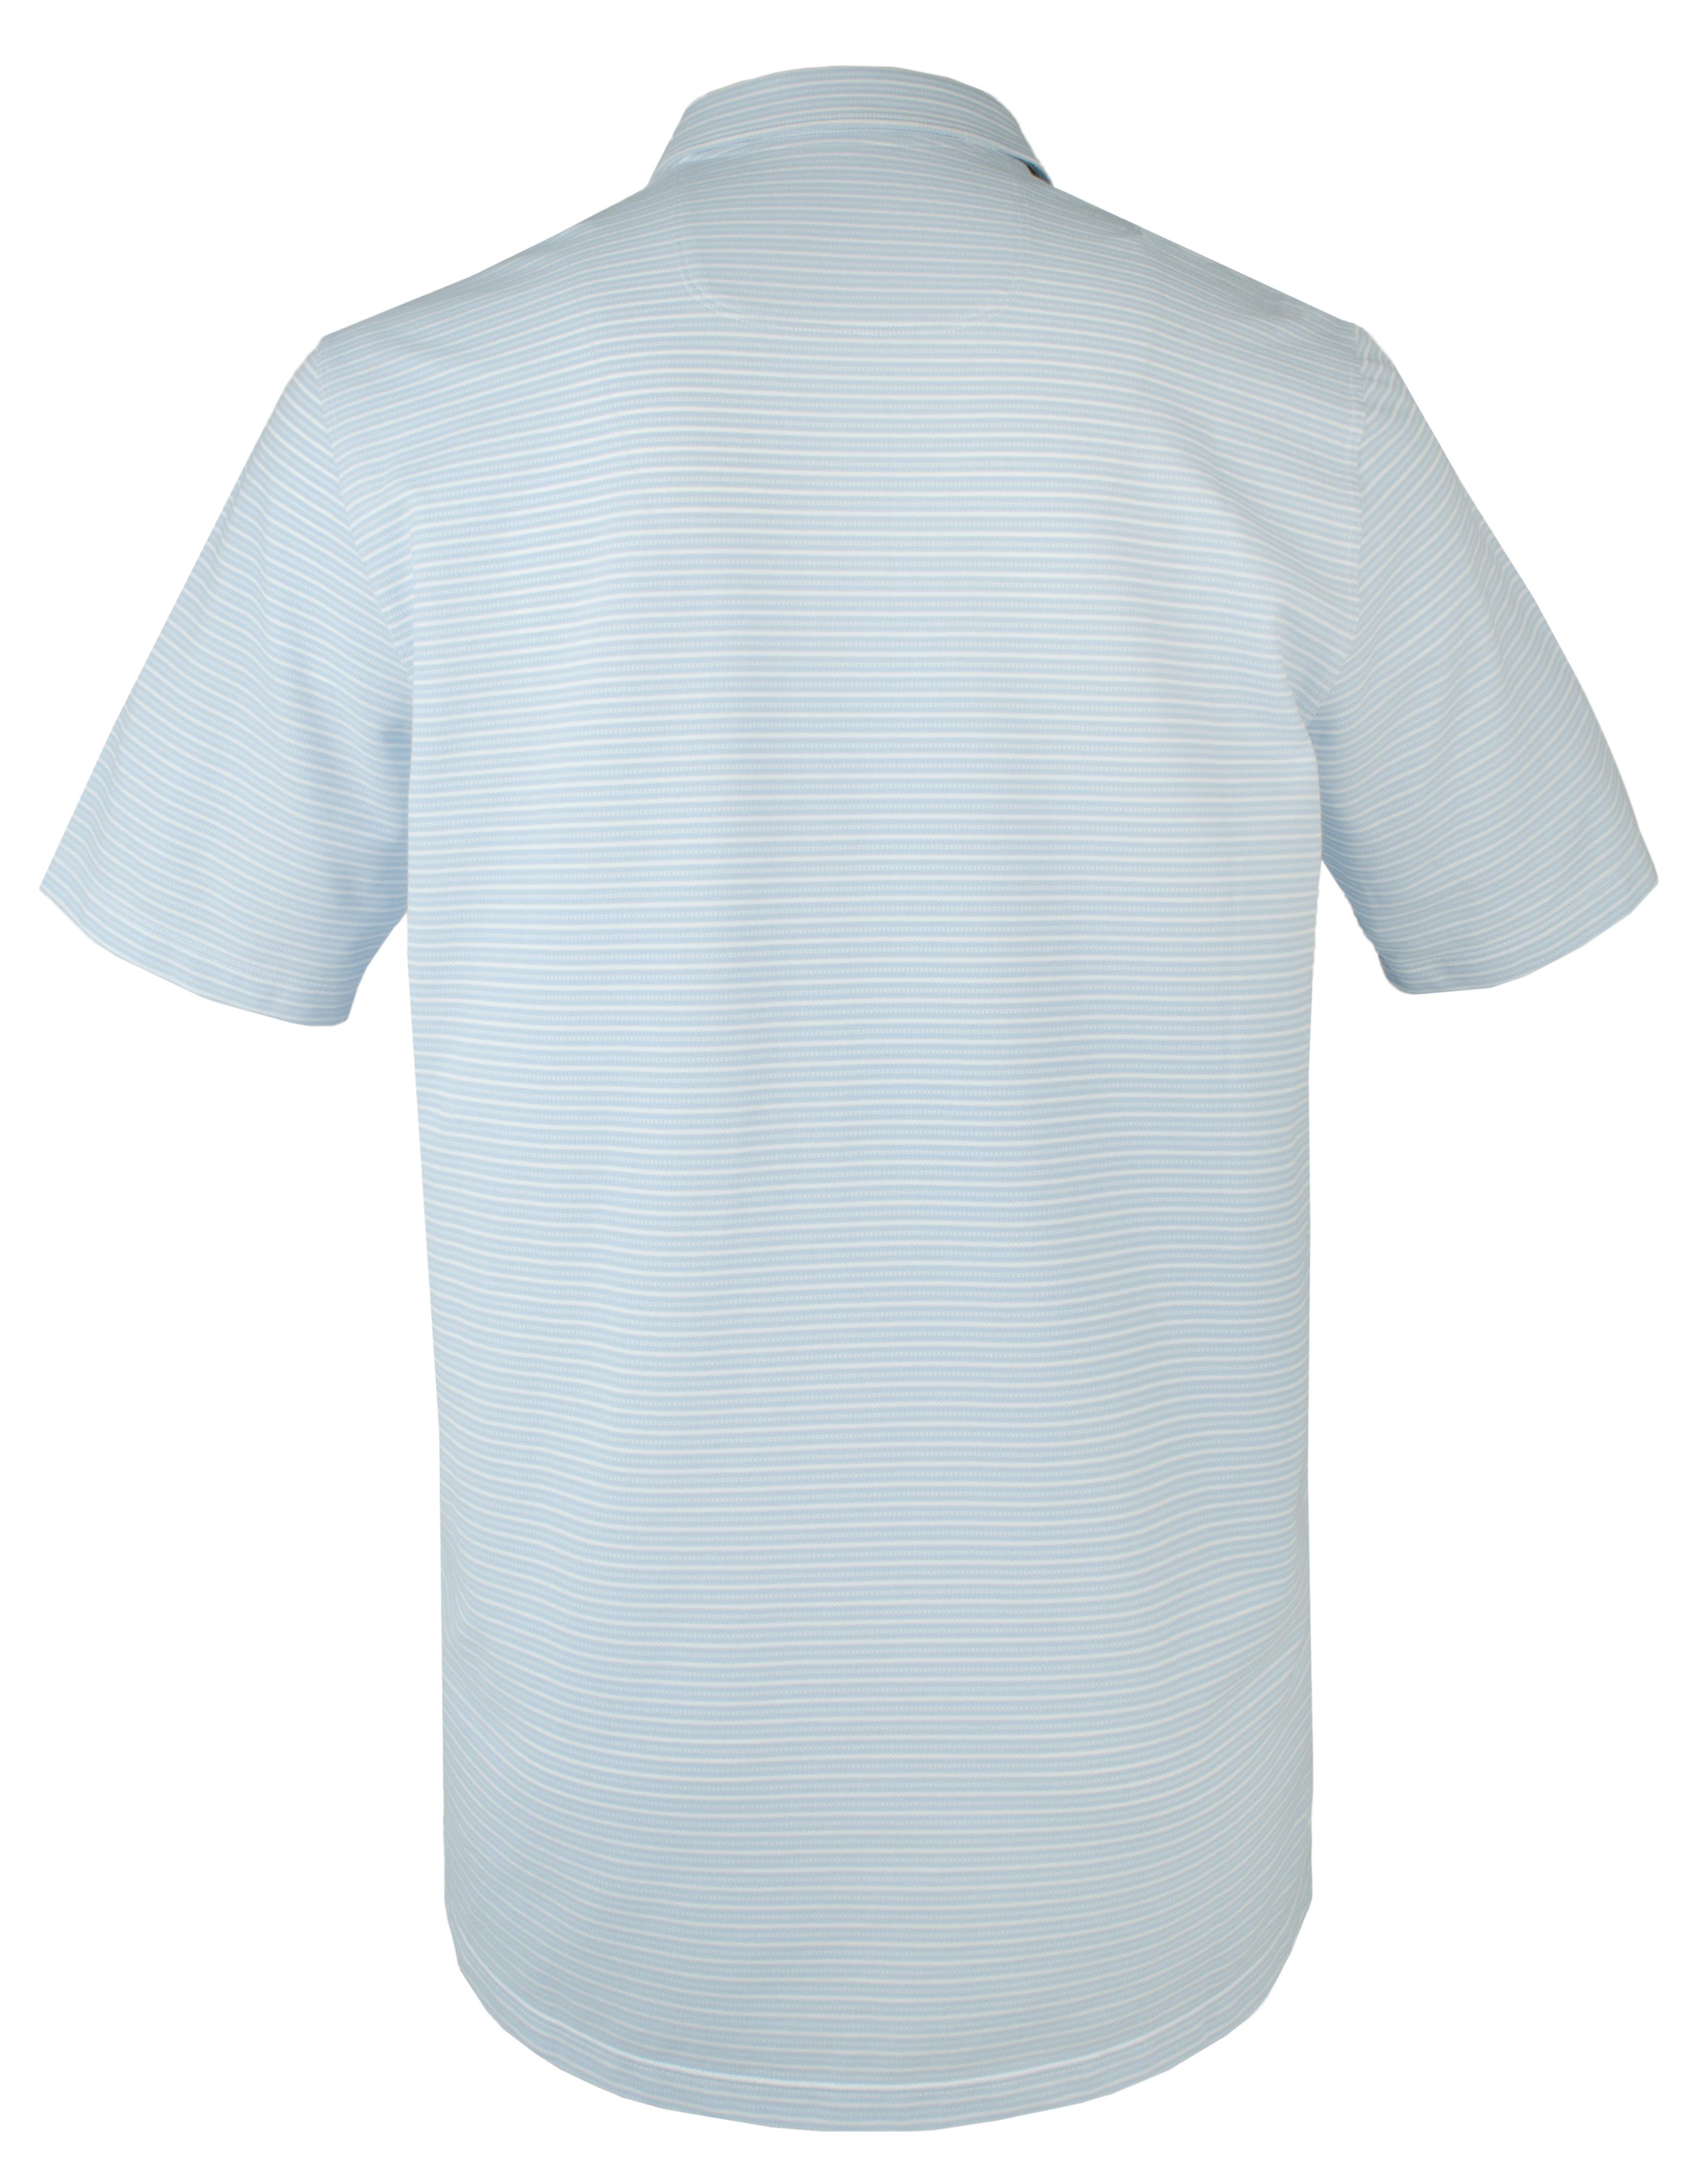 Tommy-Bahama-Men-039-s-Big-amp-Tall-Marina-Marlin-IslandZone-Polo-Shirt thumbnail 11